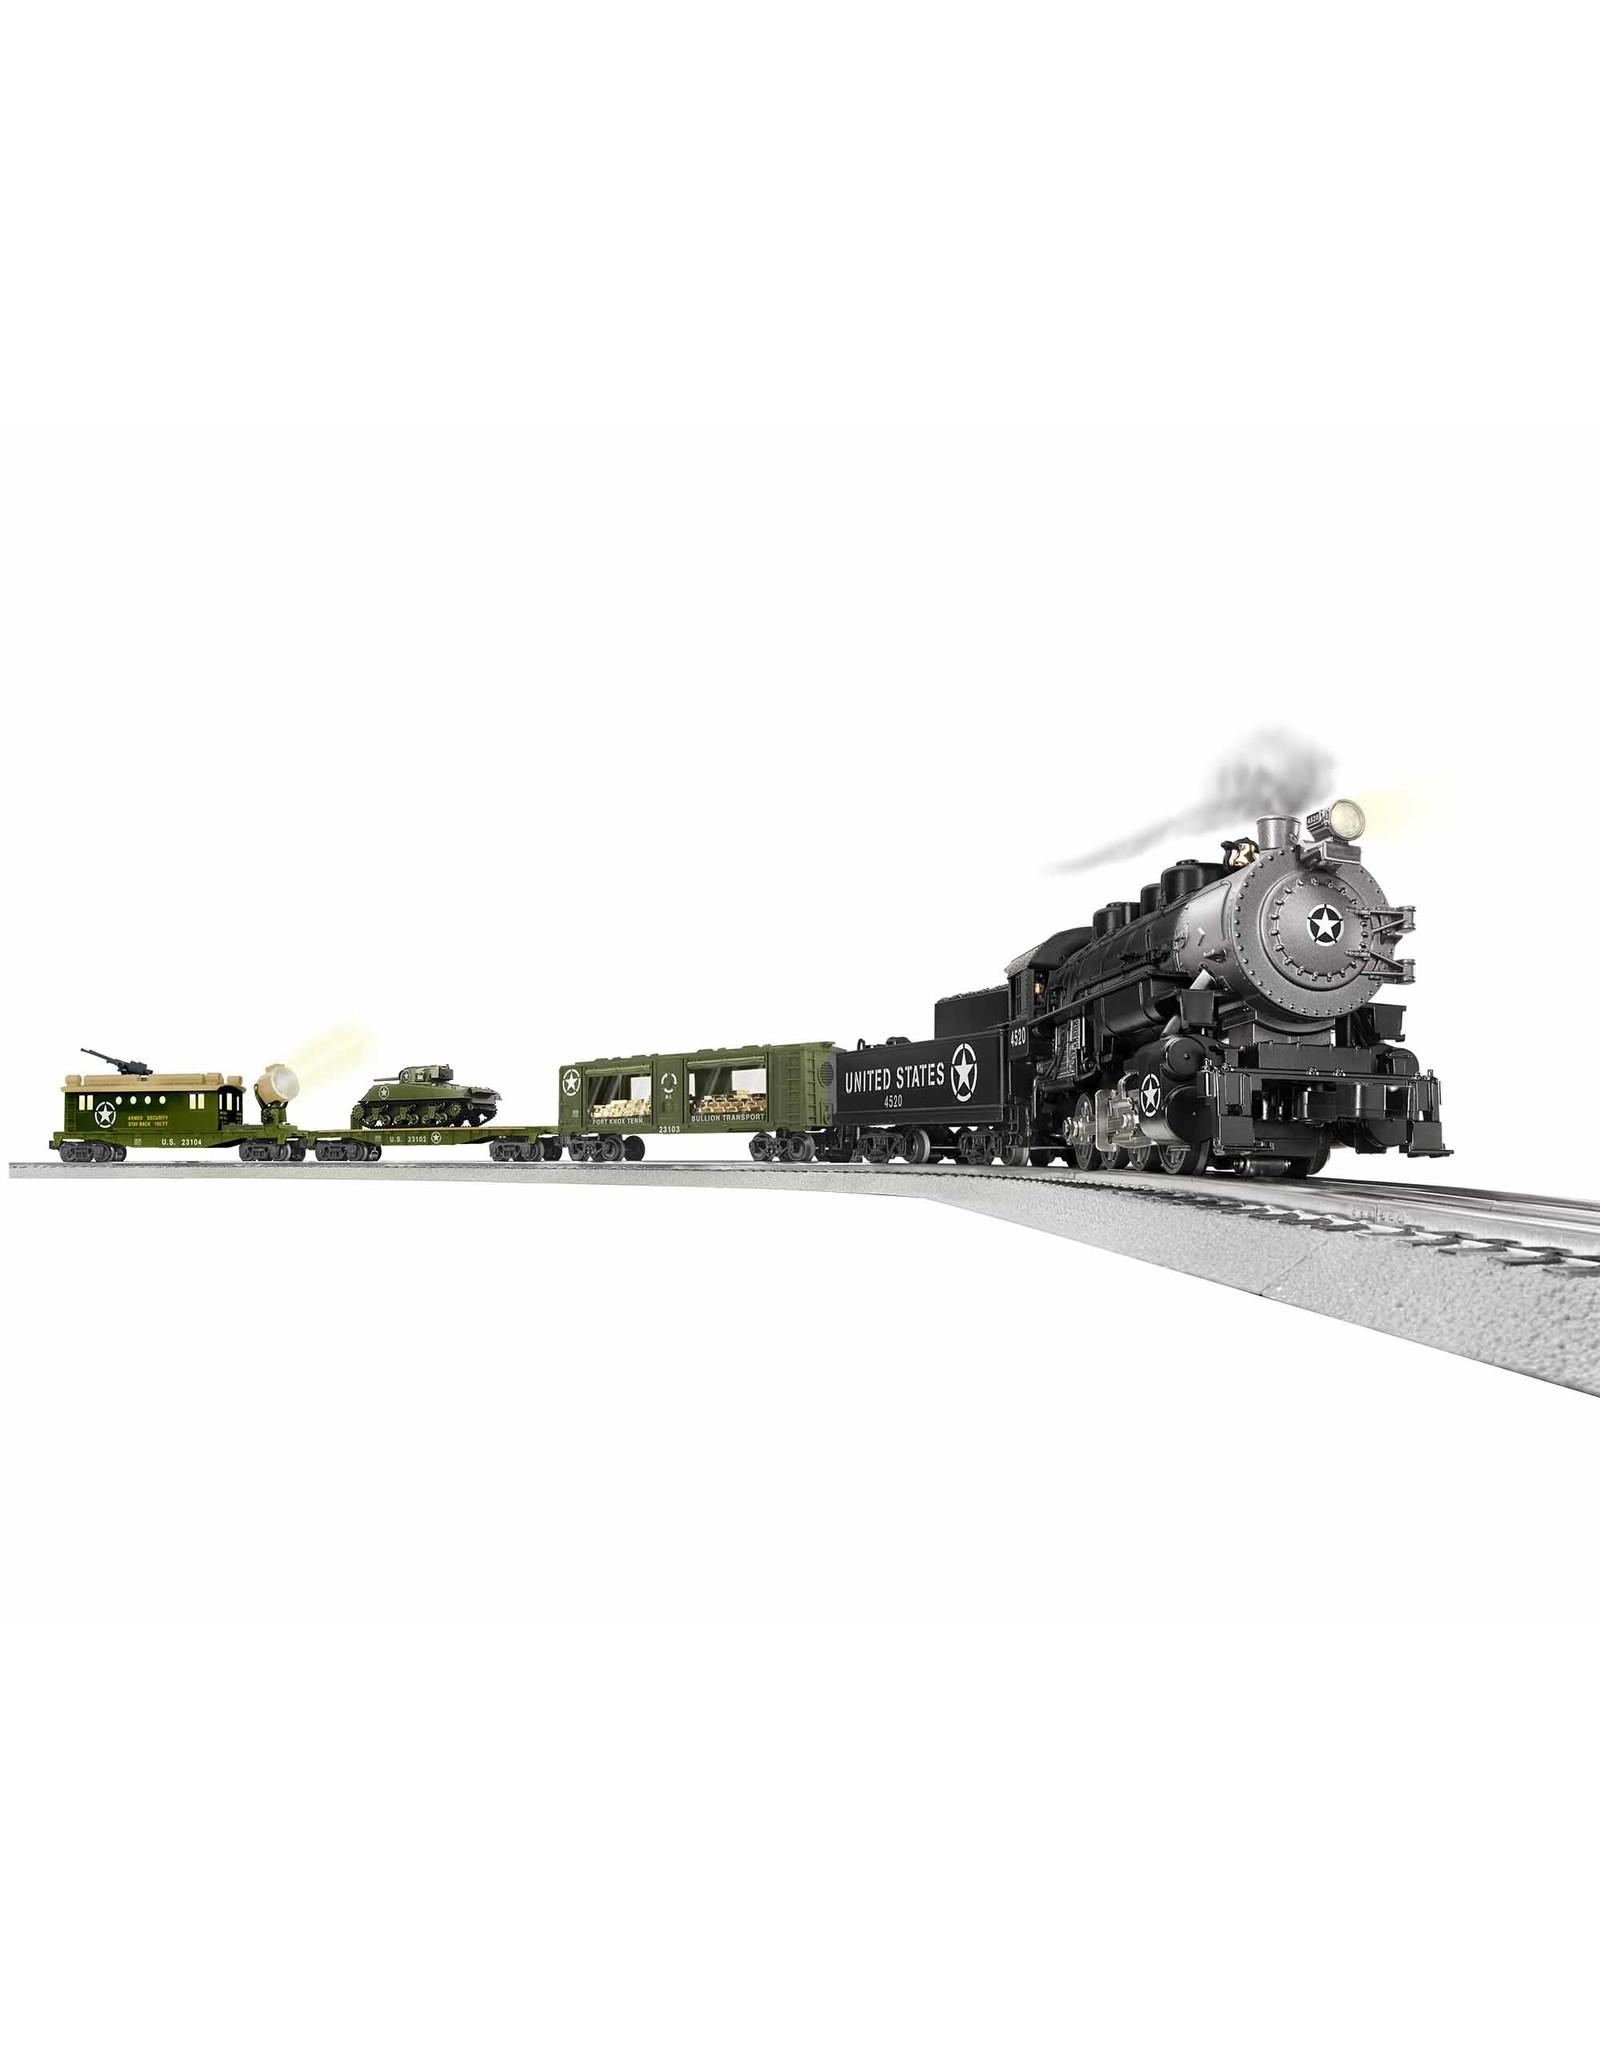 Lionel U.S. Steam - LionChief Ready to Run Train Set